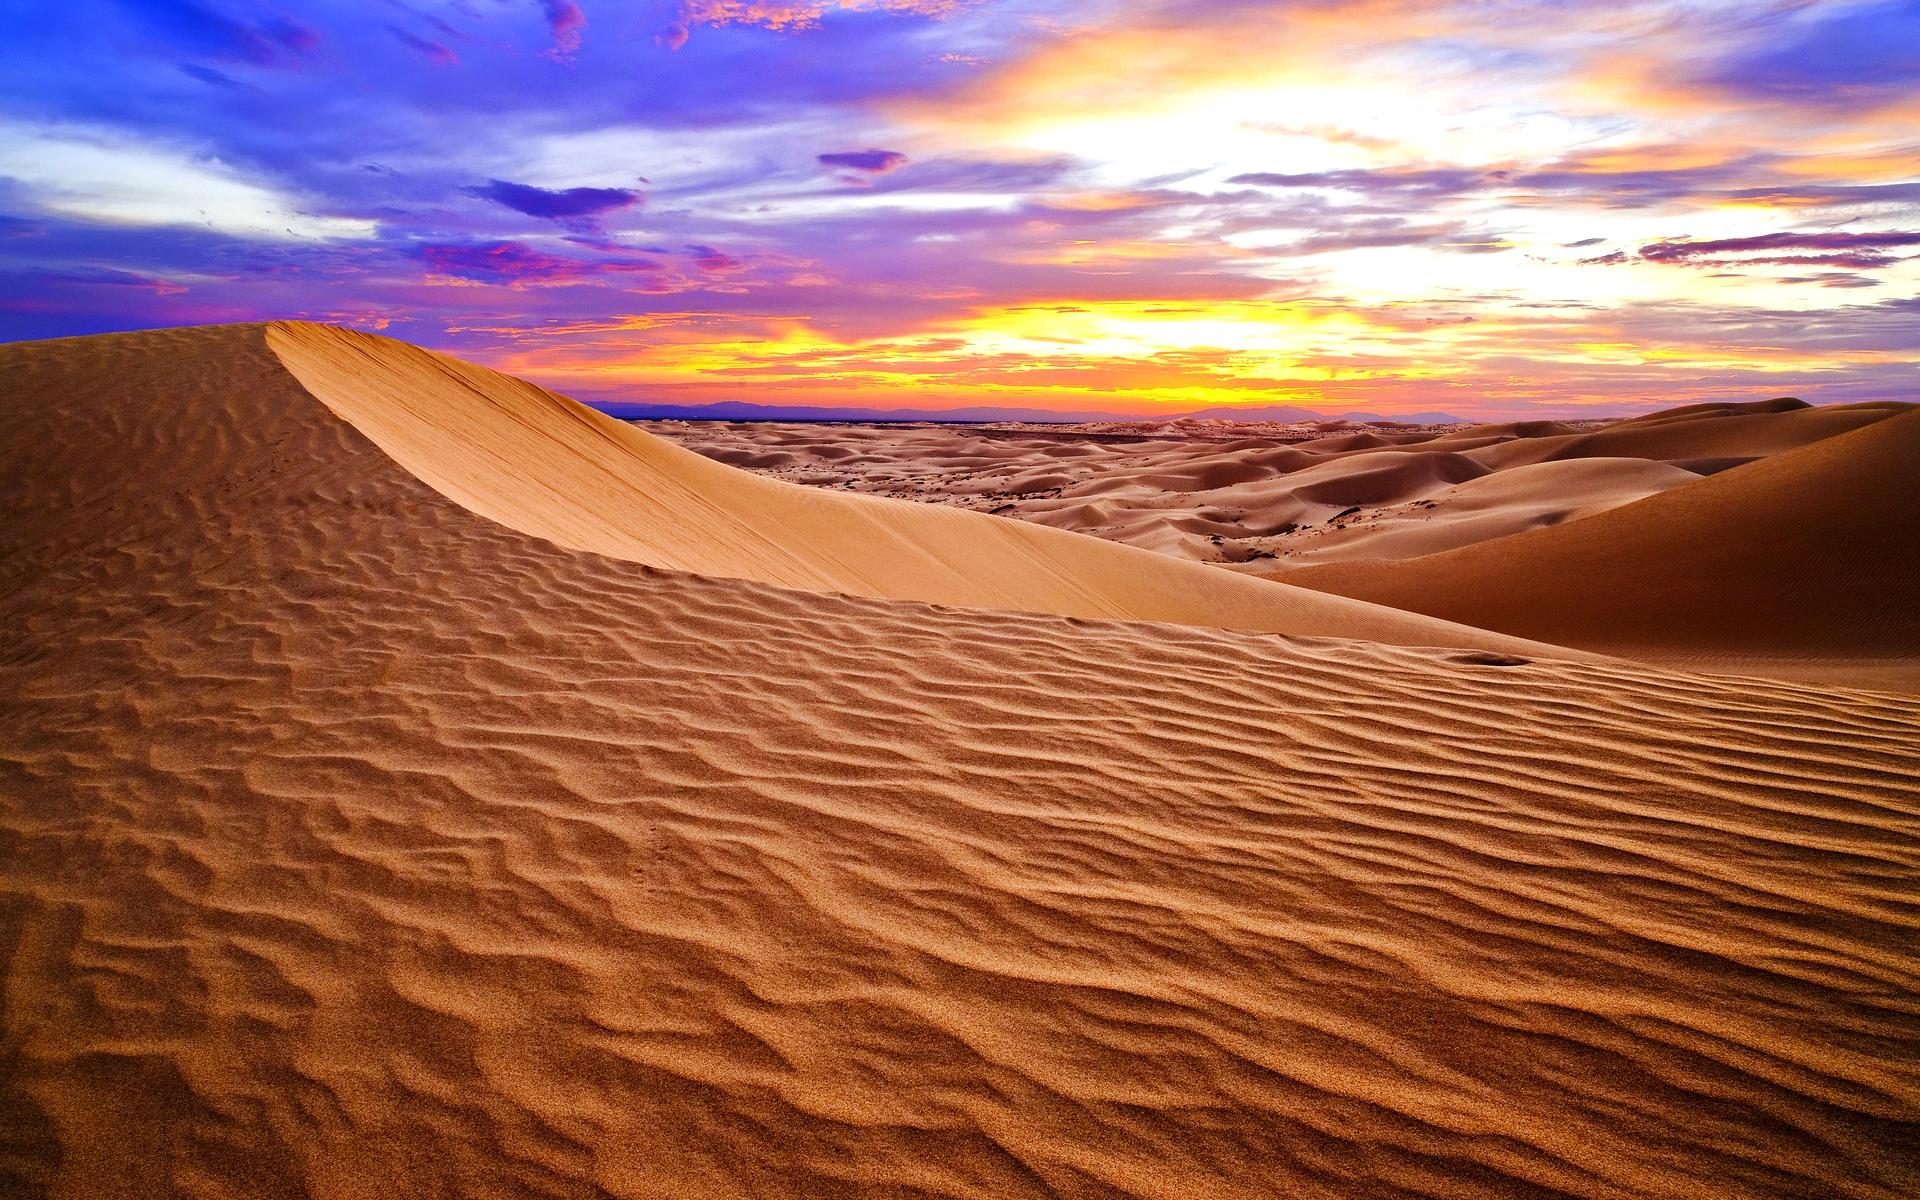 download free desert wallpaper 16497 1920x1200 px high resolution